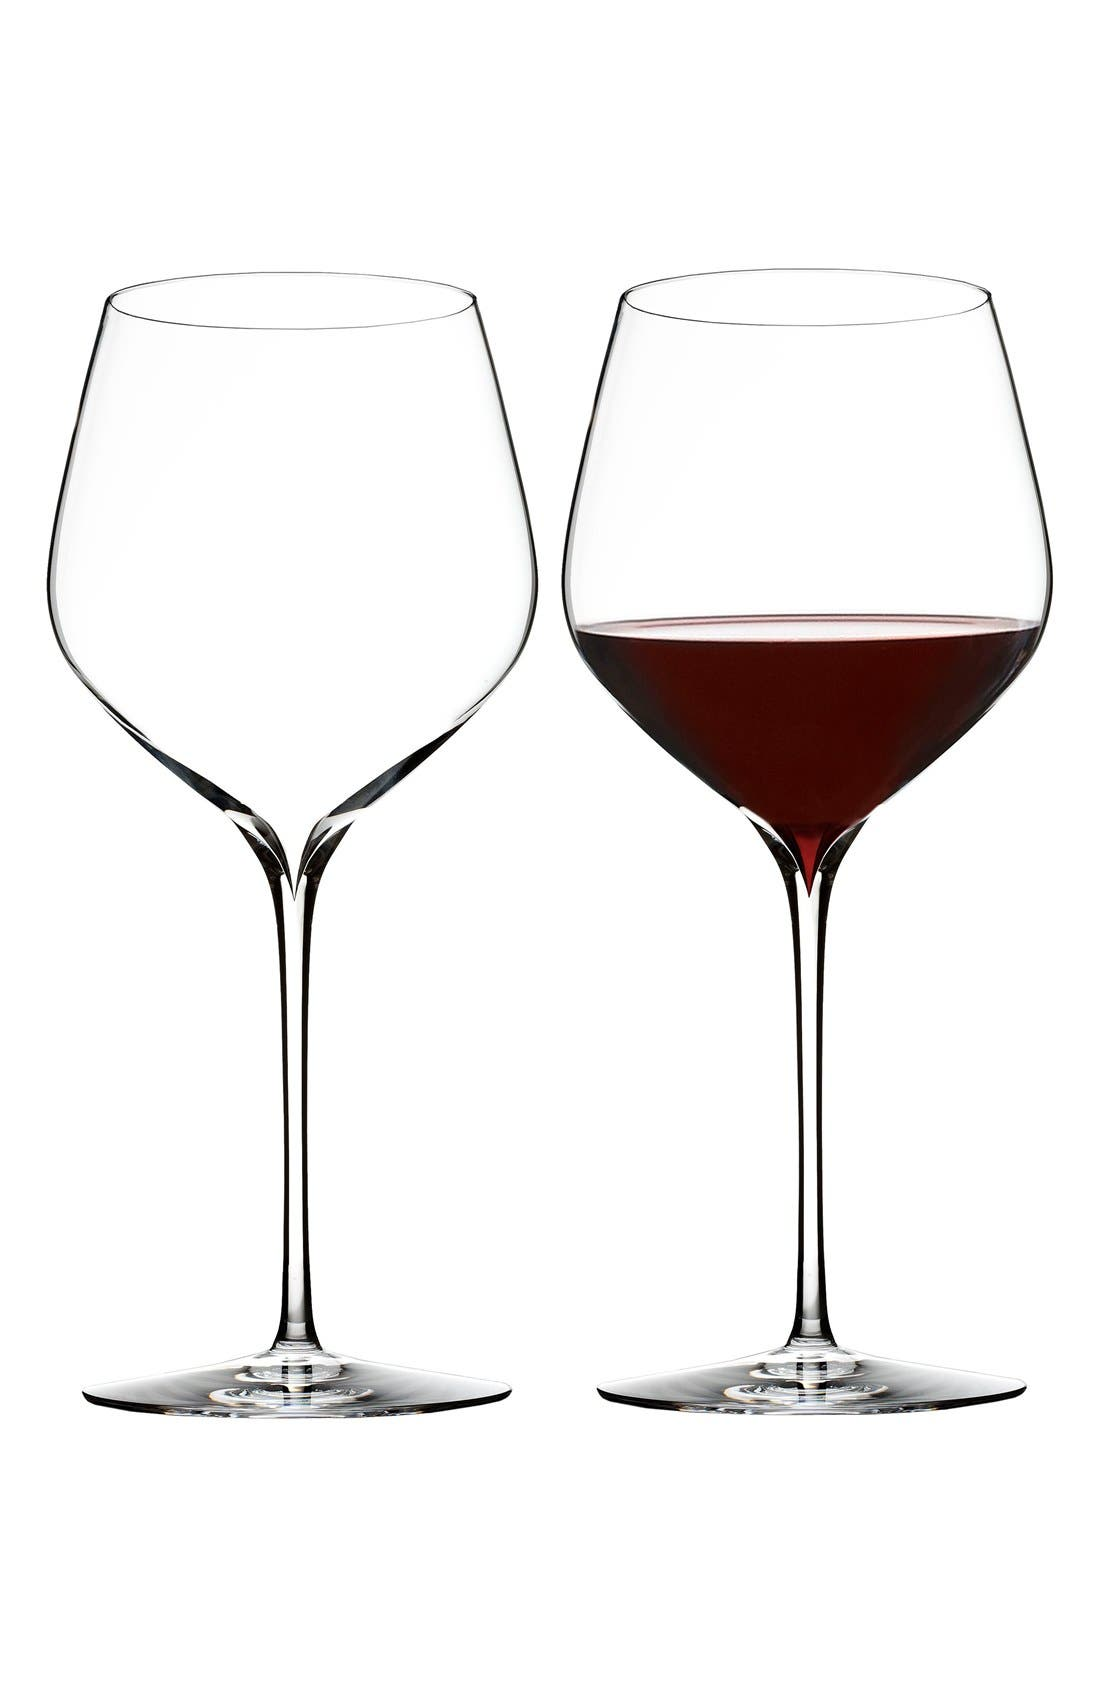 'Elegance' Fine Crystal Cabernet Sauvignon Glasses,                             Alternate thumbnail 2, color,                             Clear